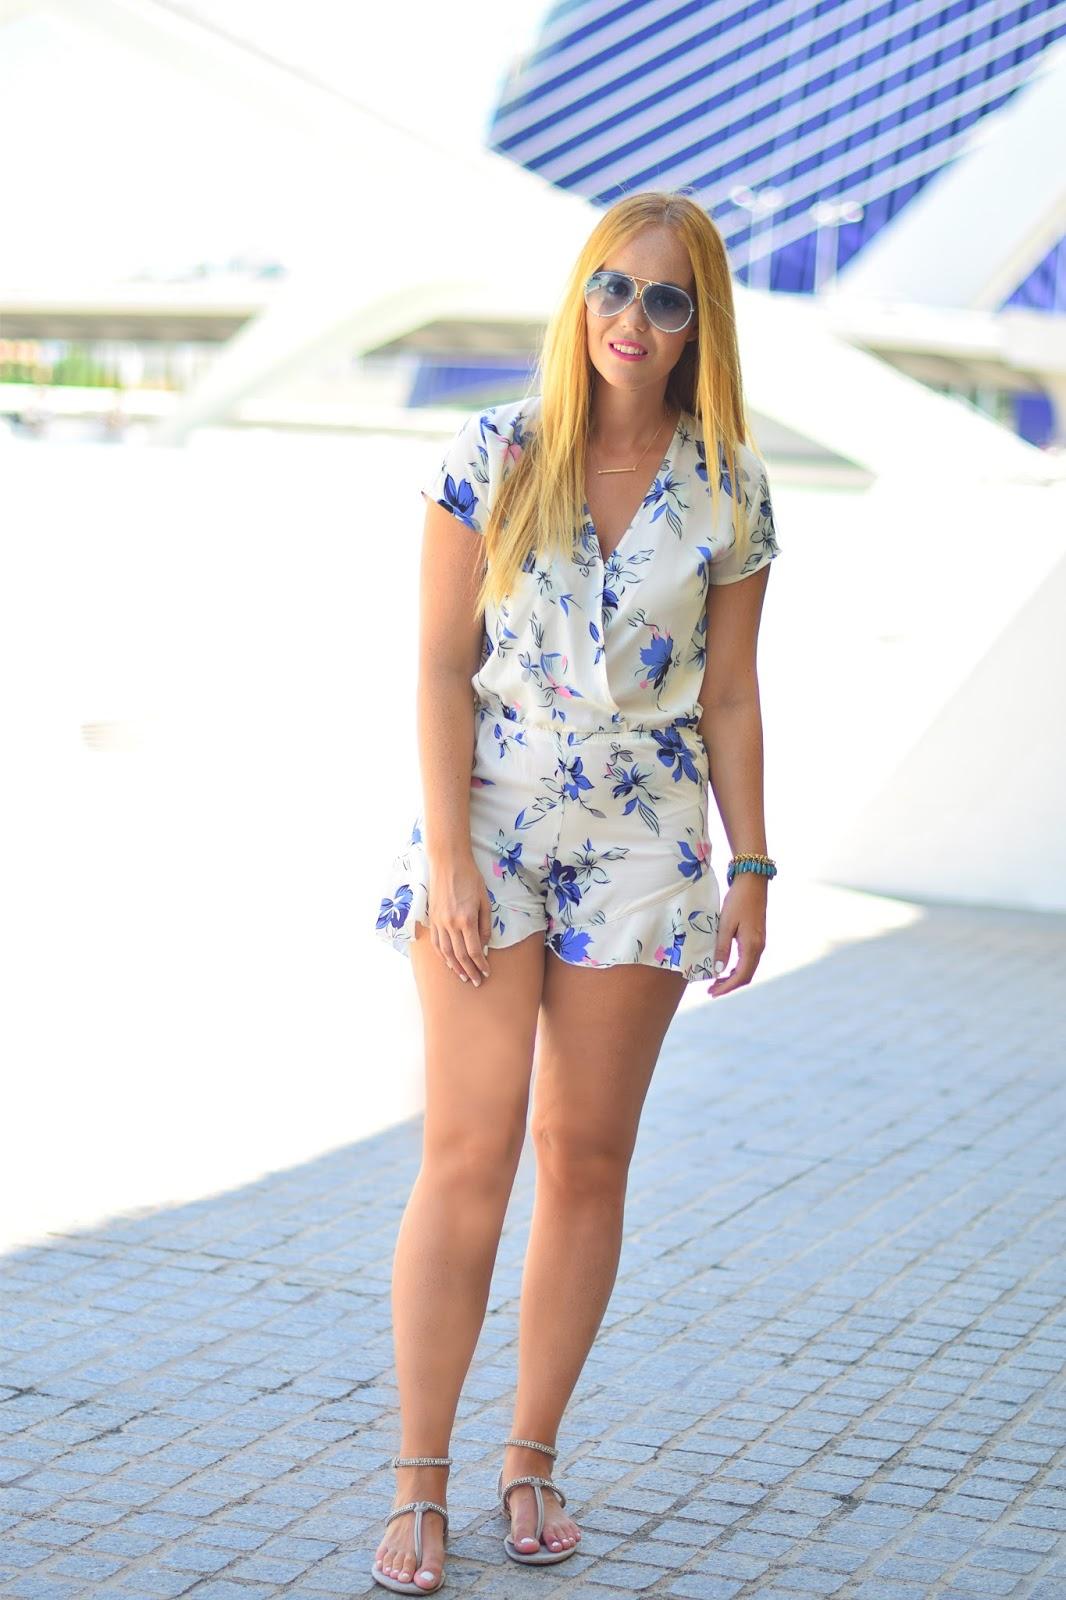 nery hdez, yrb fashion , carolee, porsche design, valencia, floral print